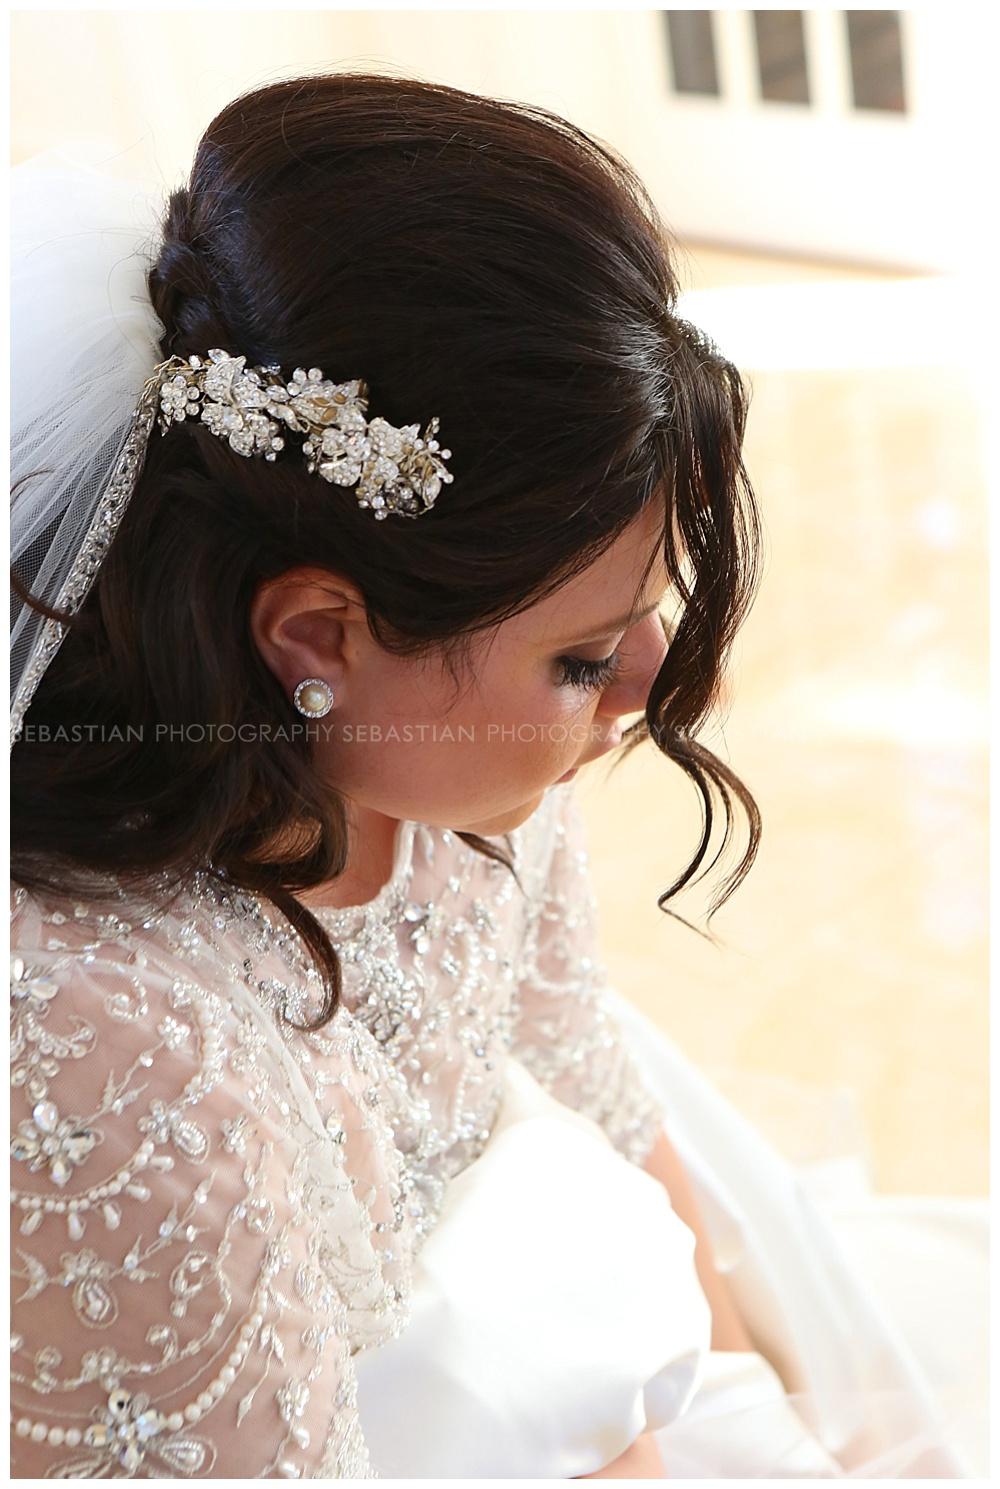 Sebastian_Photography_Aria_Wedding_Photography_09.jpg